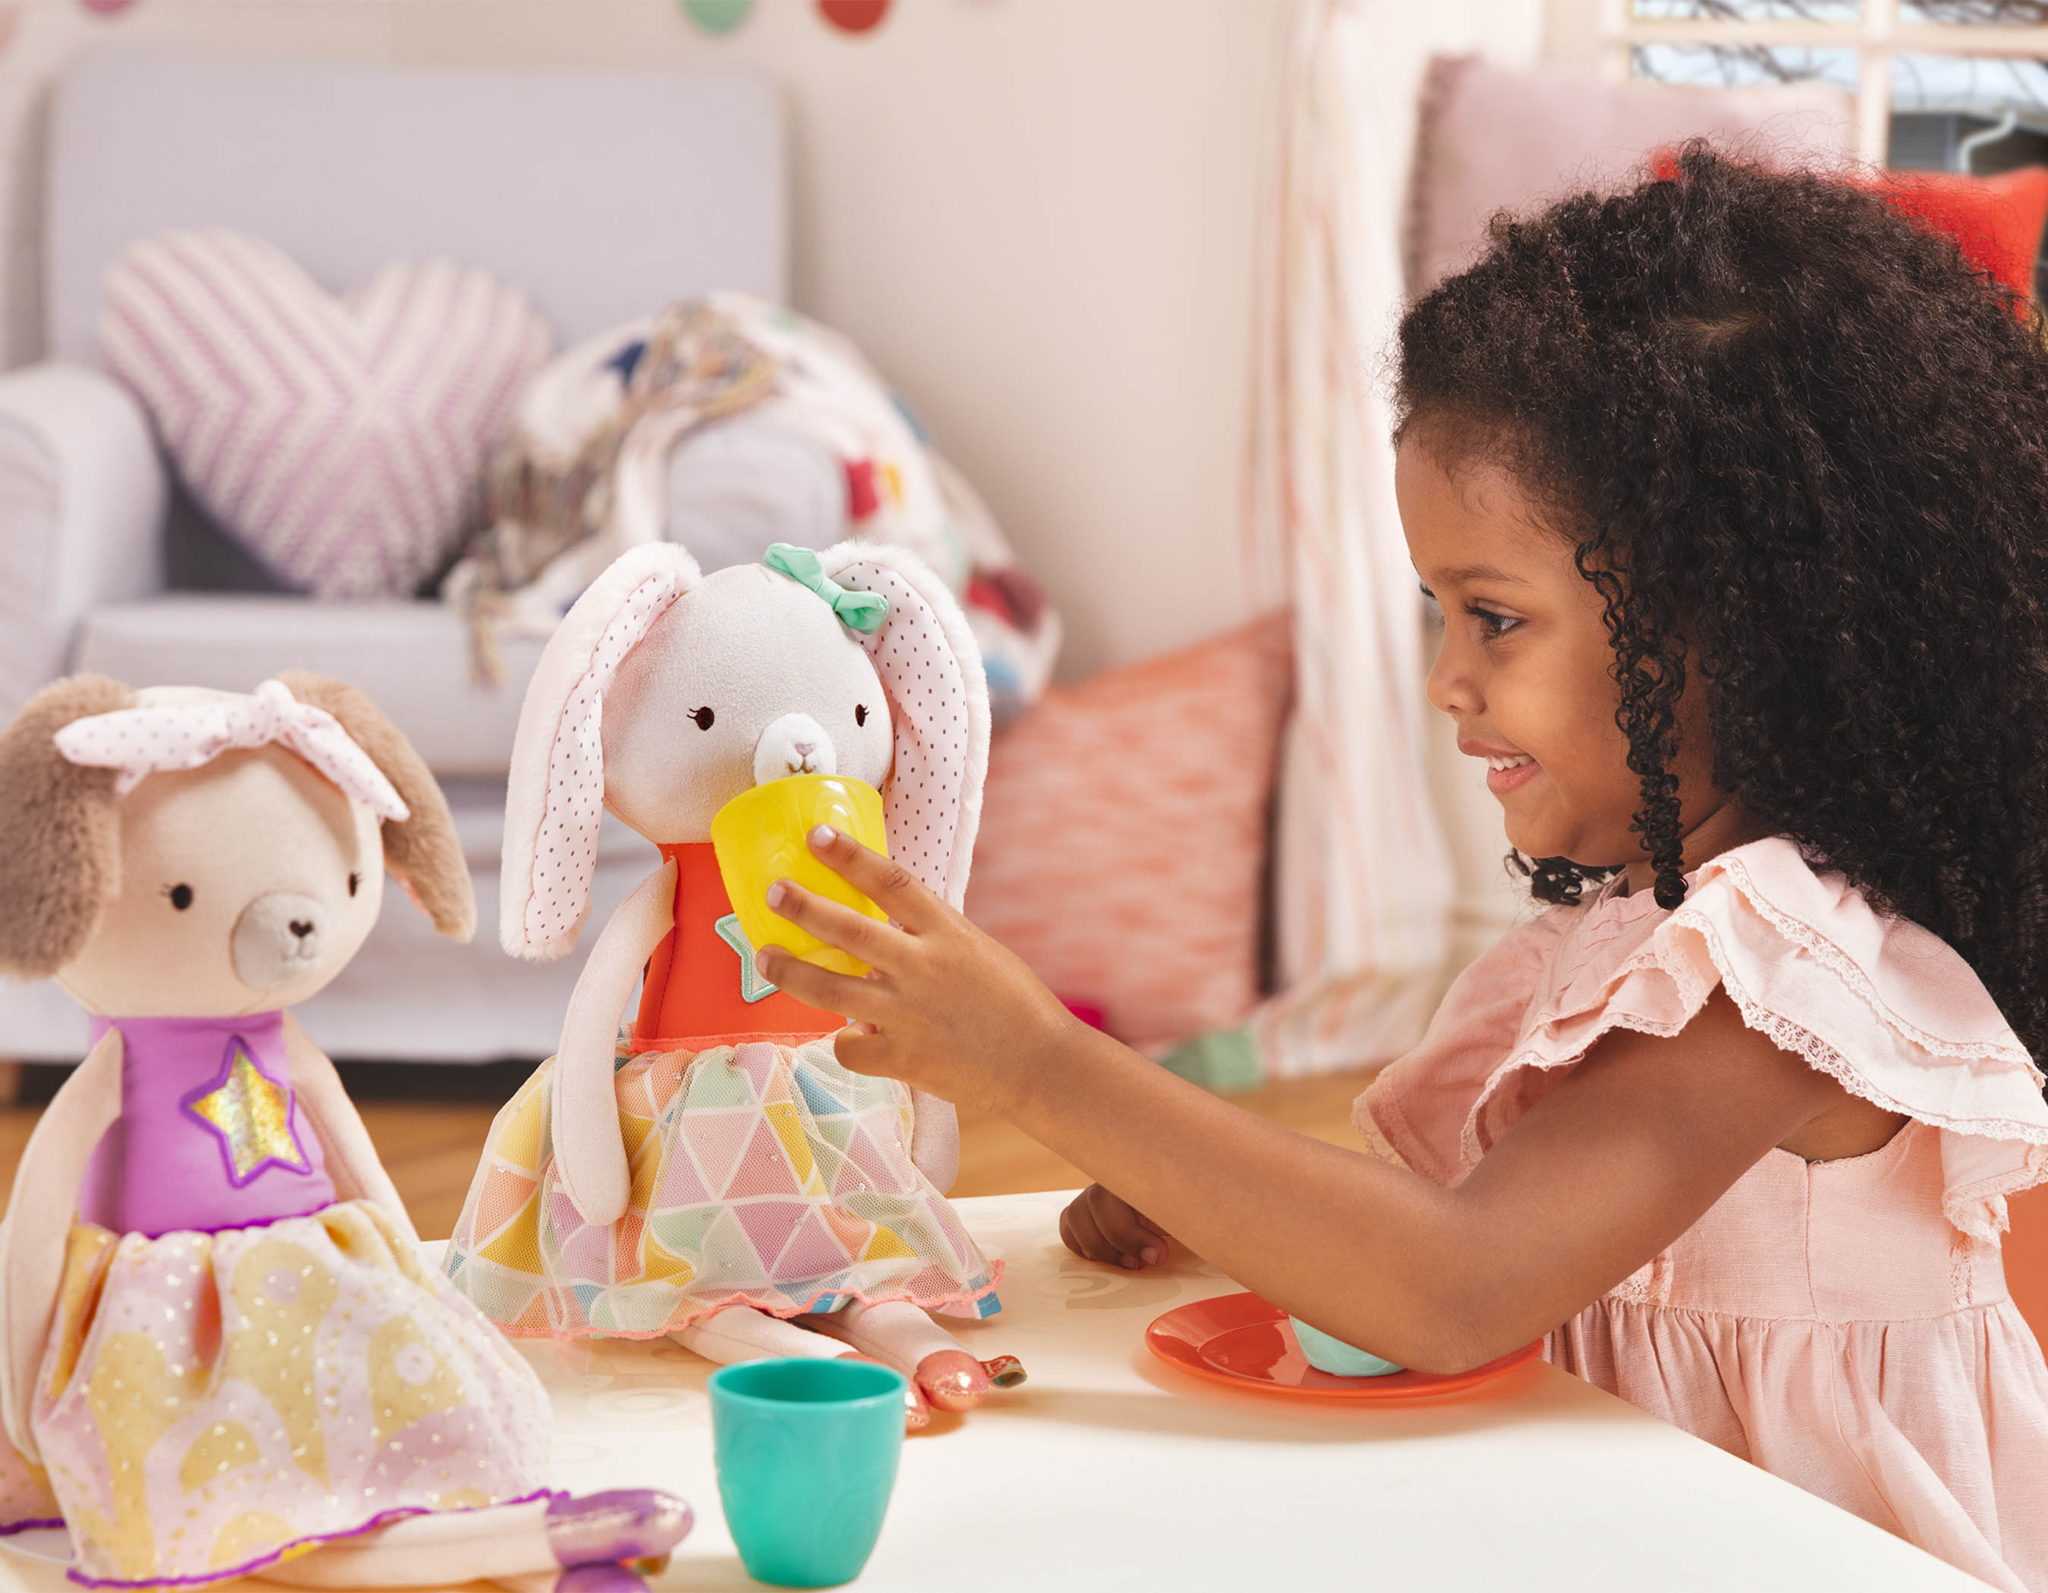 Girl and two stuffed animal dolls.